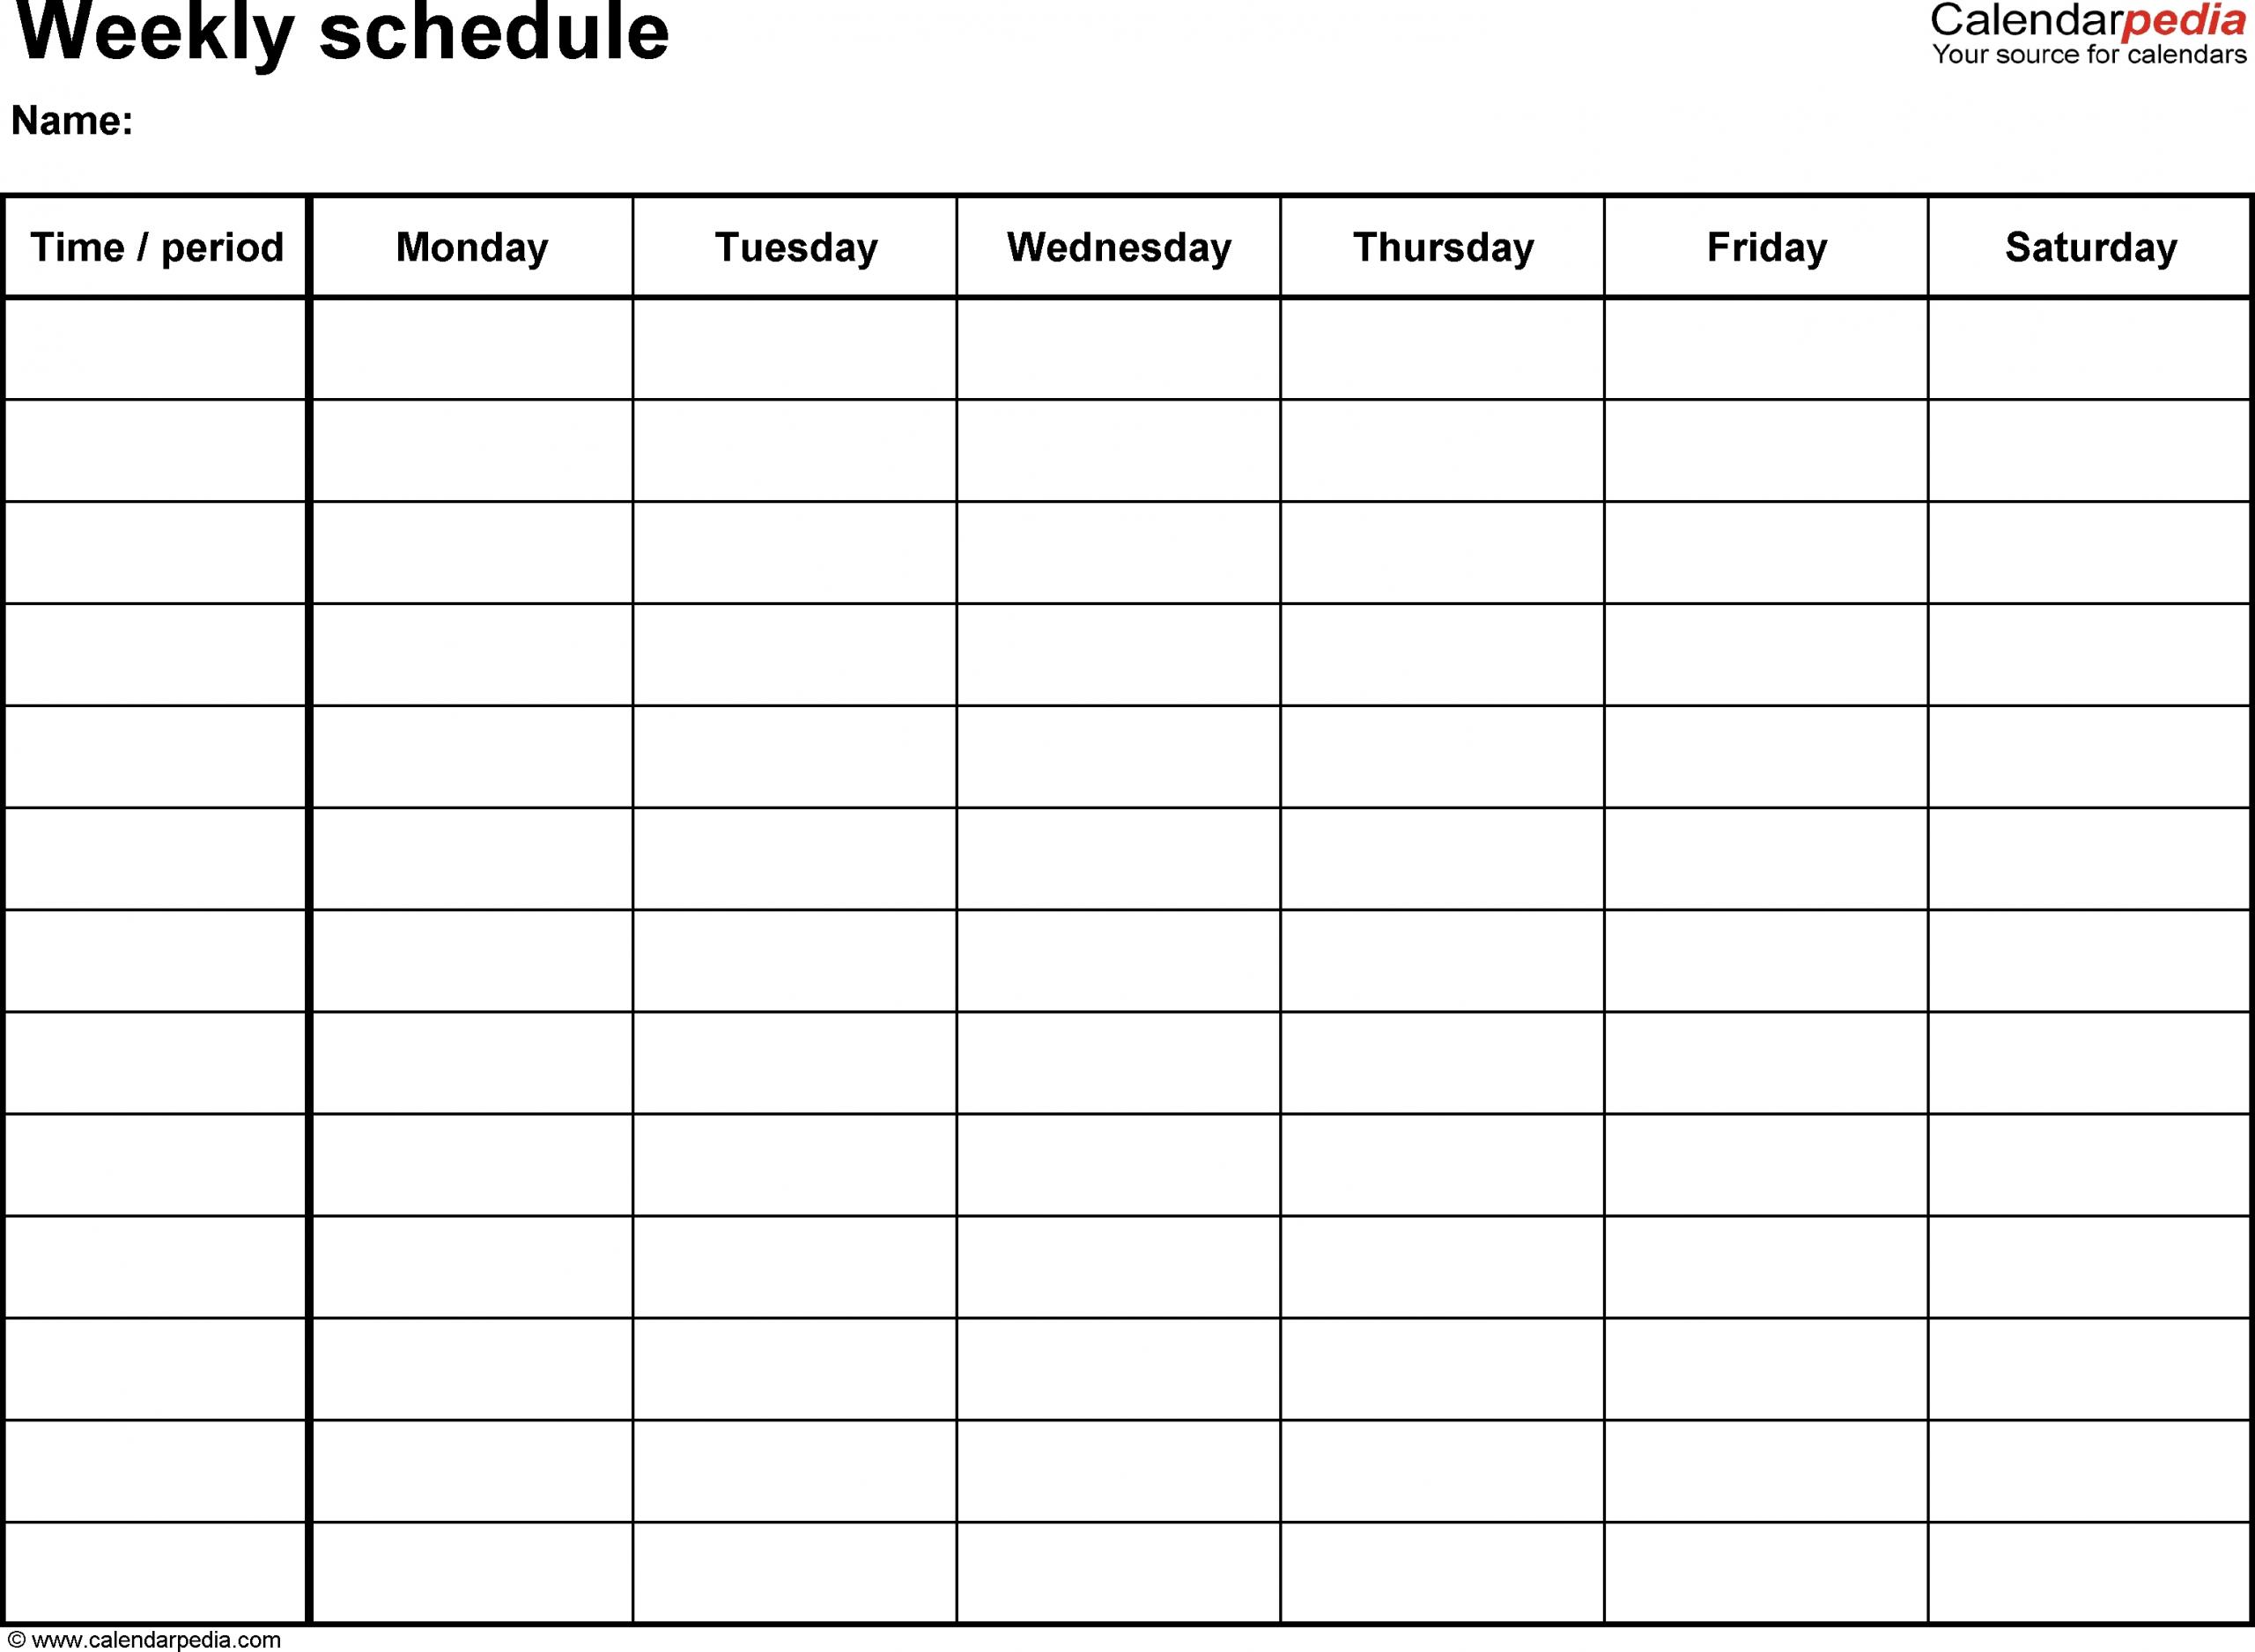 Printable Weekly Calendar With 15 Minute Time Slots